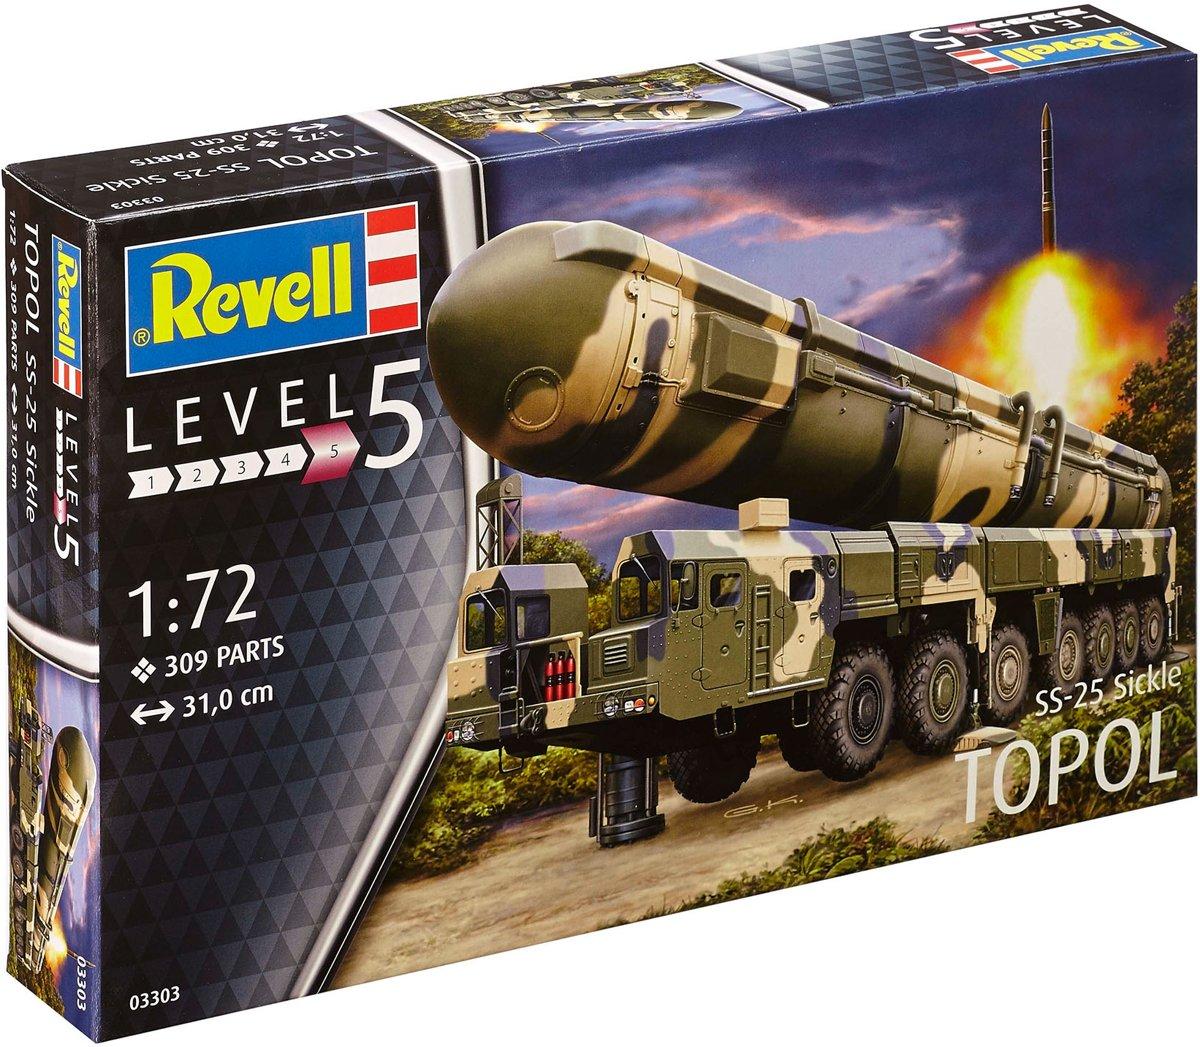 Revell modelbouwpakket TOPOL SS-25 Sickle